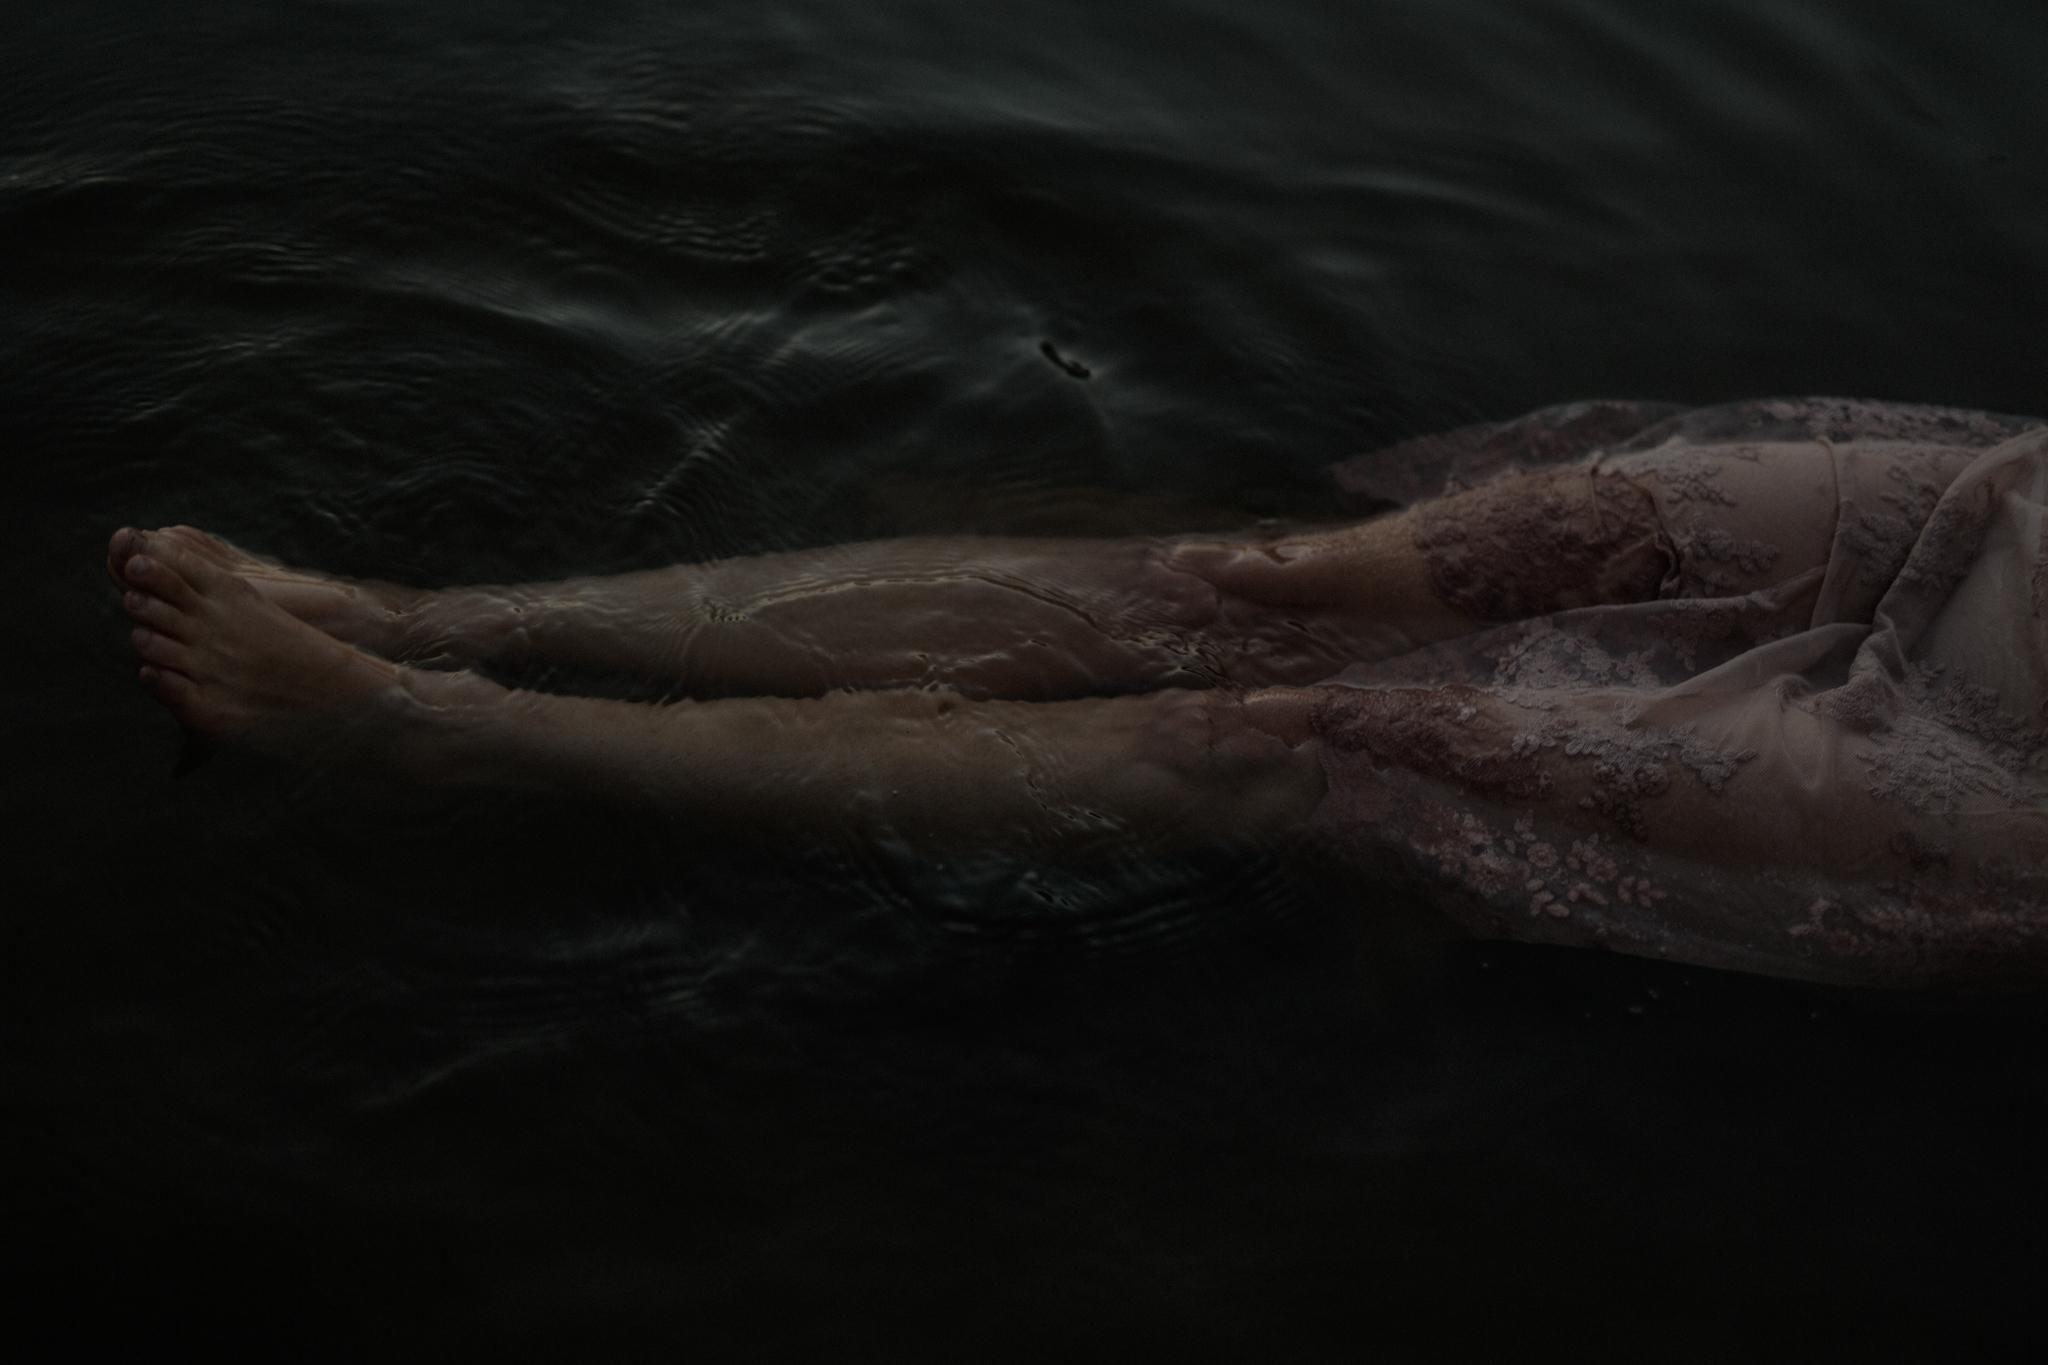 nude lace slip by nahina lingerie photos by iamsarahrose sarah rose